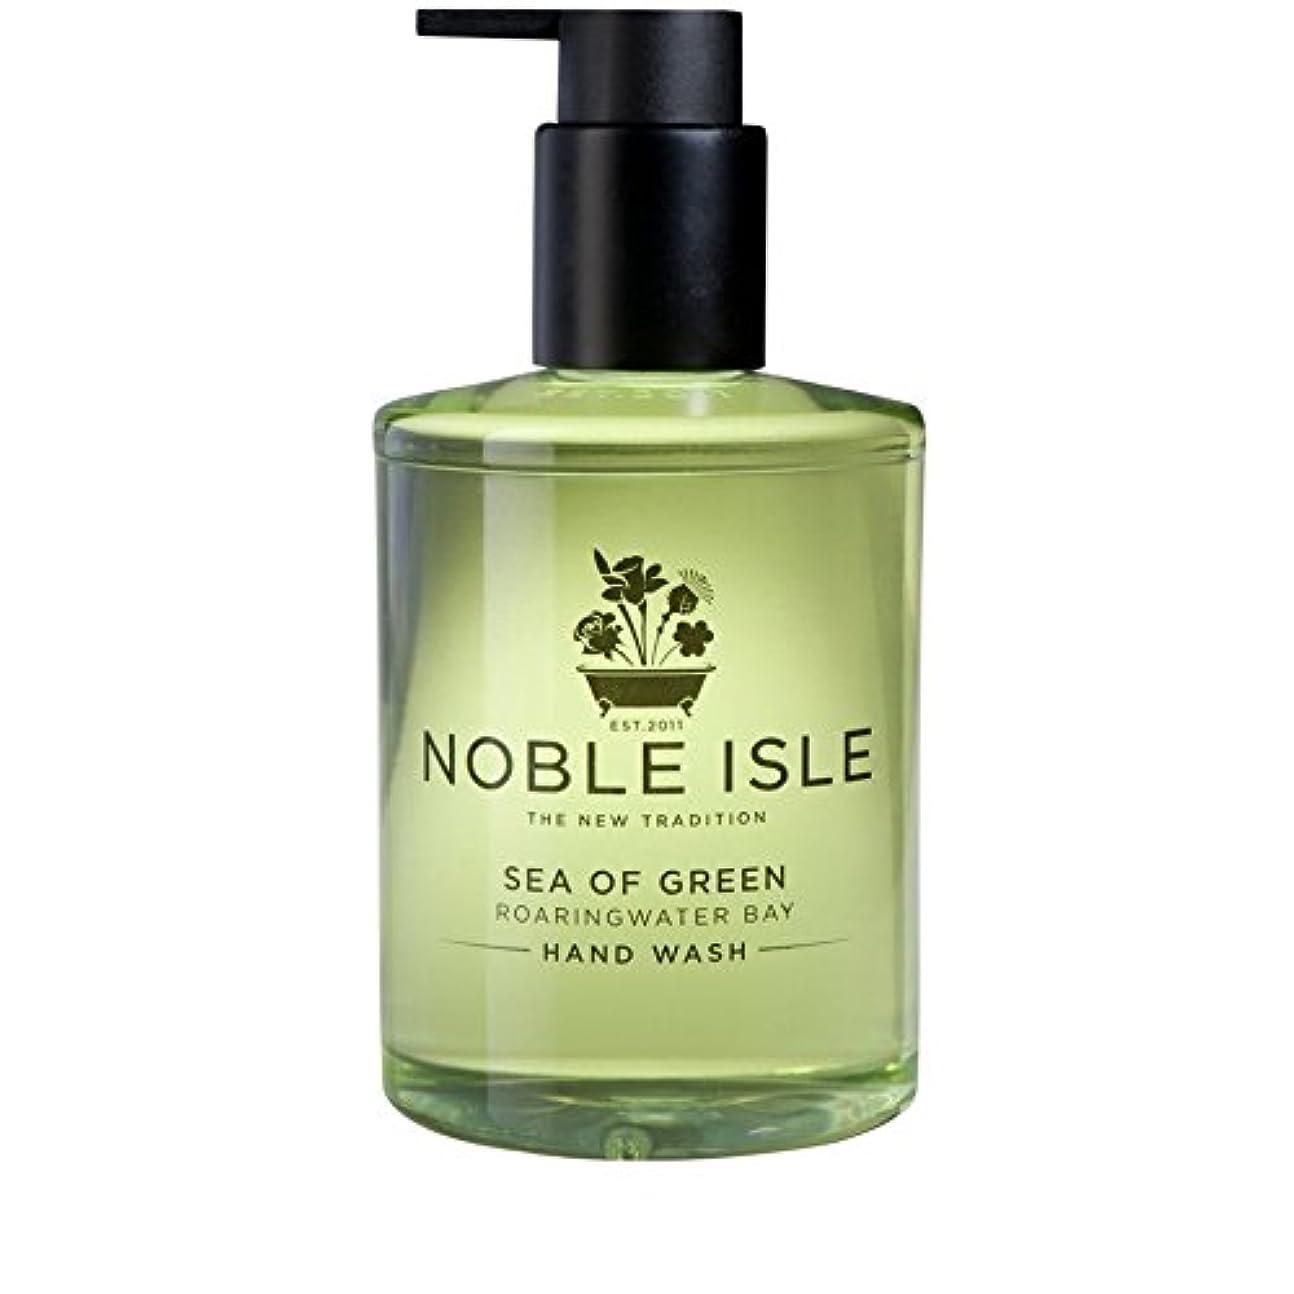 Noble Isle Sea of Green Roaringwater Bay Hand Wash 250ml (Pack of 6) - 緑ベイハンドウォッシュ250ミリリットルの高貴な島の海 x6 [並行輸入品]